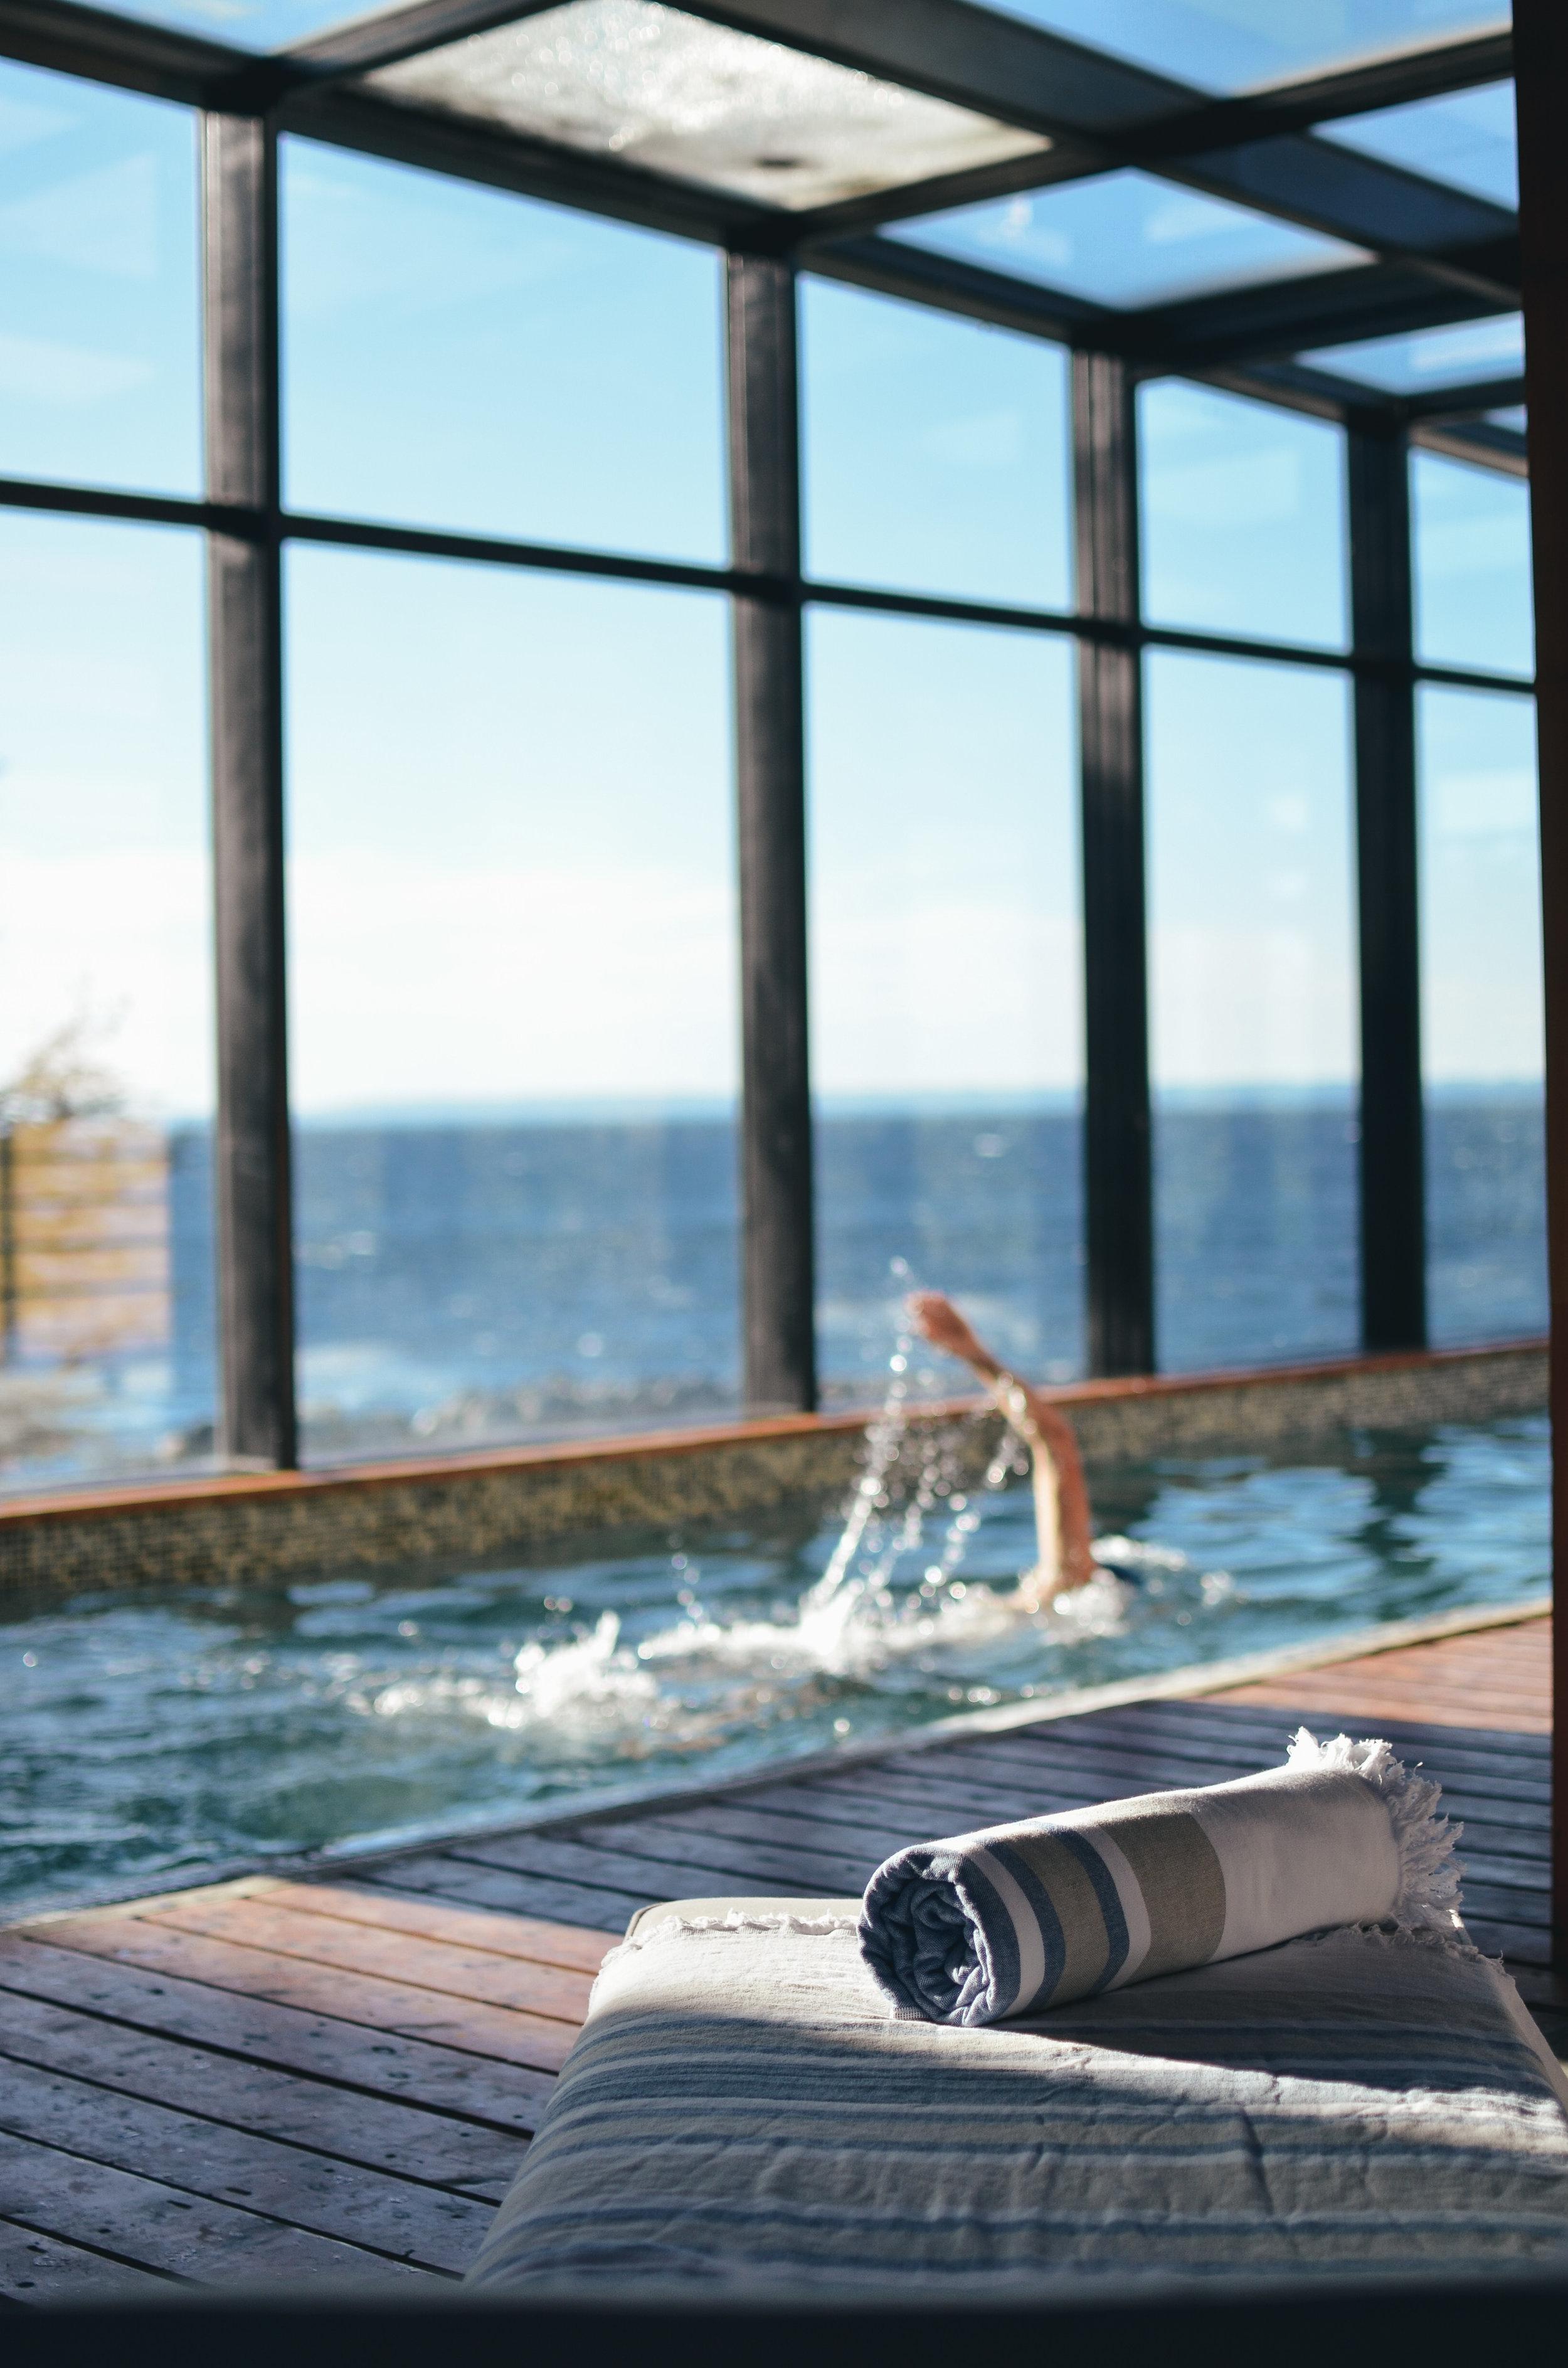 chile+awa+hotel+travel+guide+life+on+pine_DSC_1099.jpg